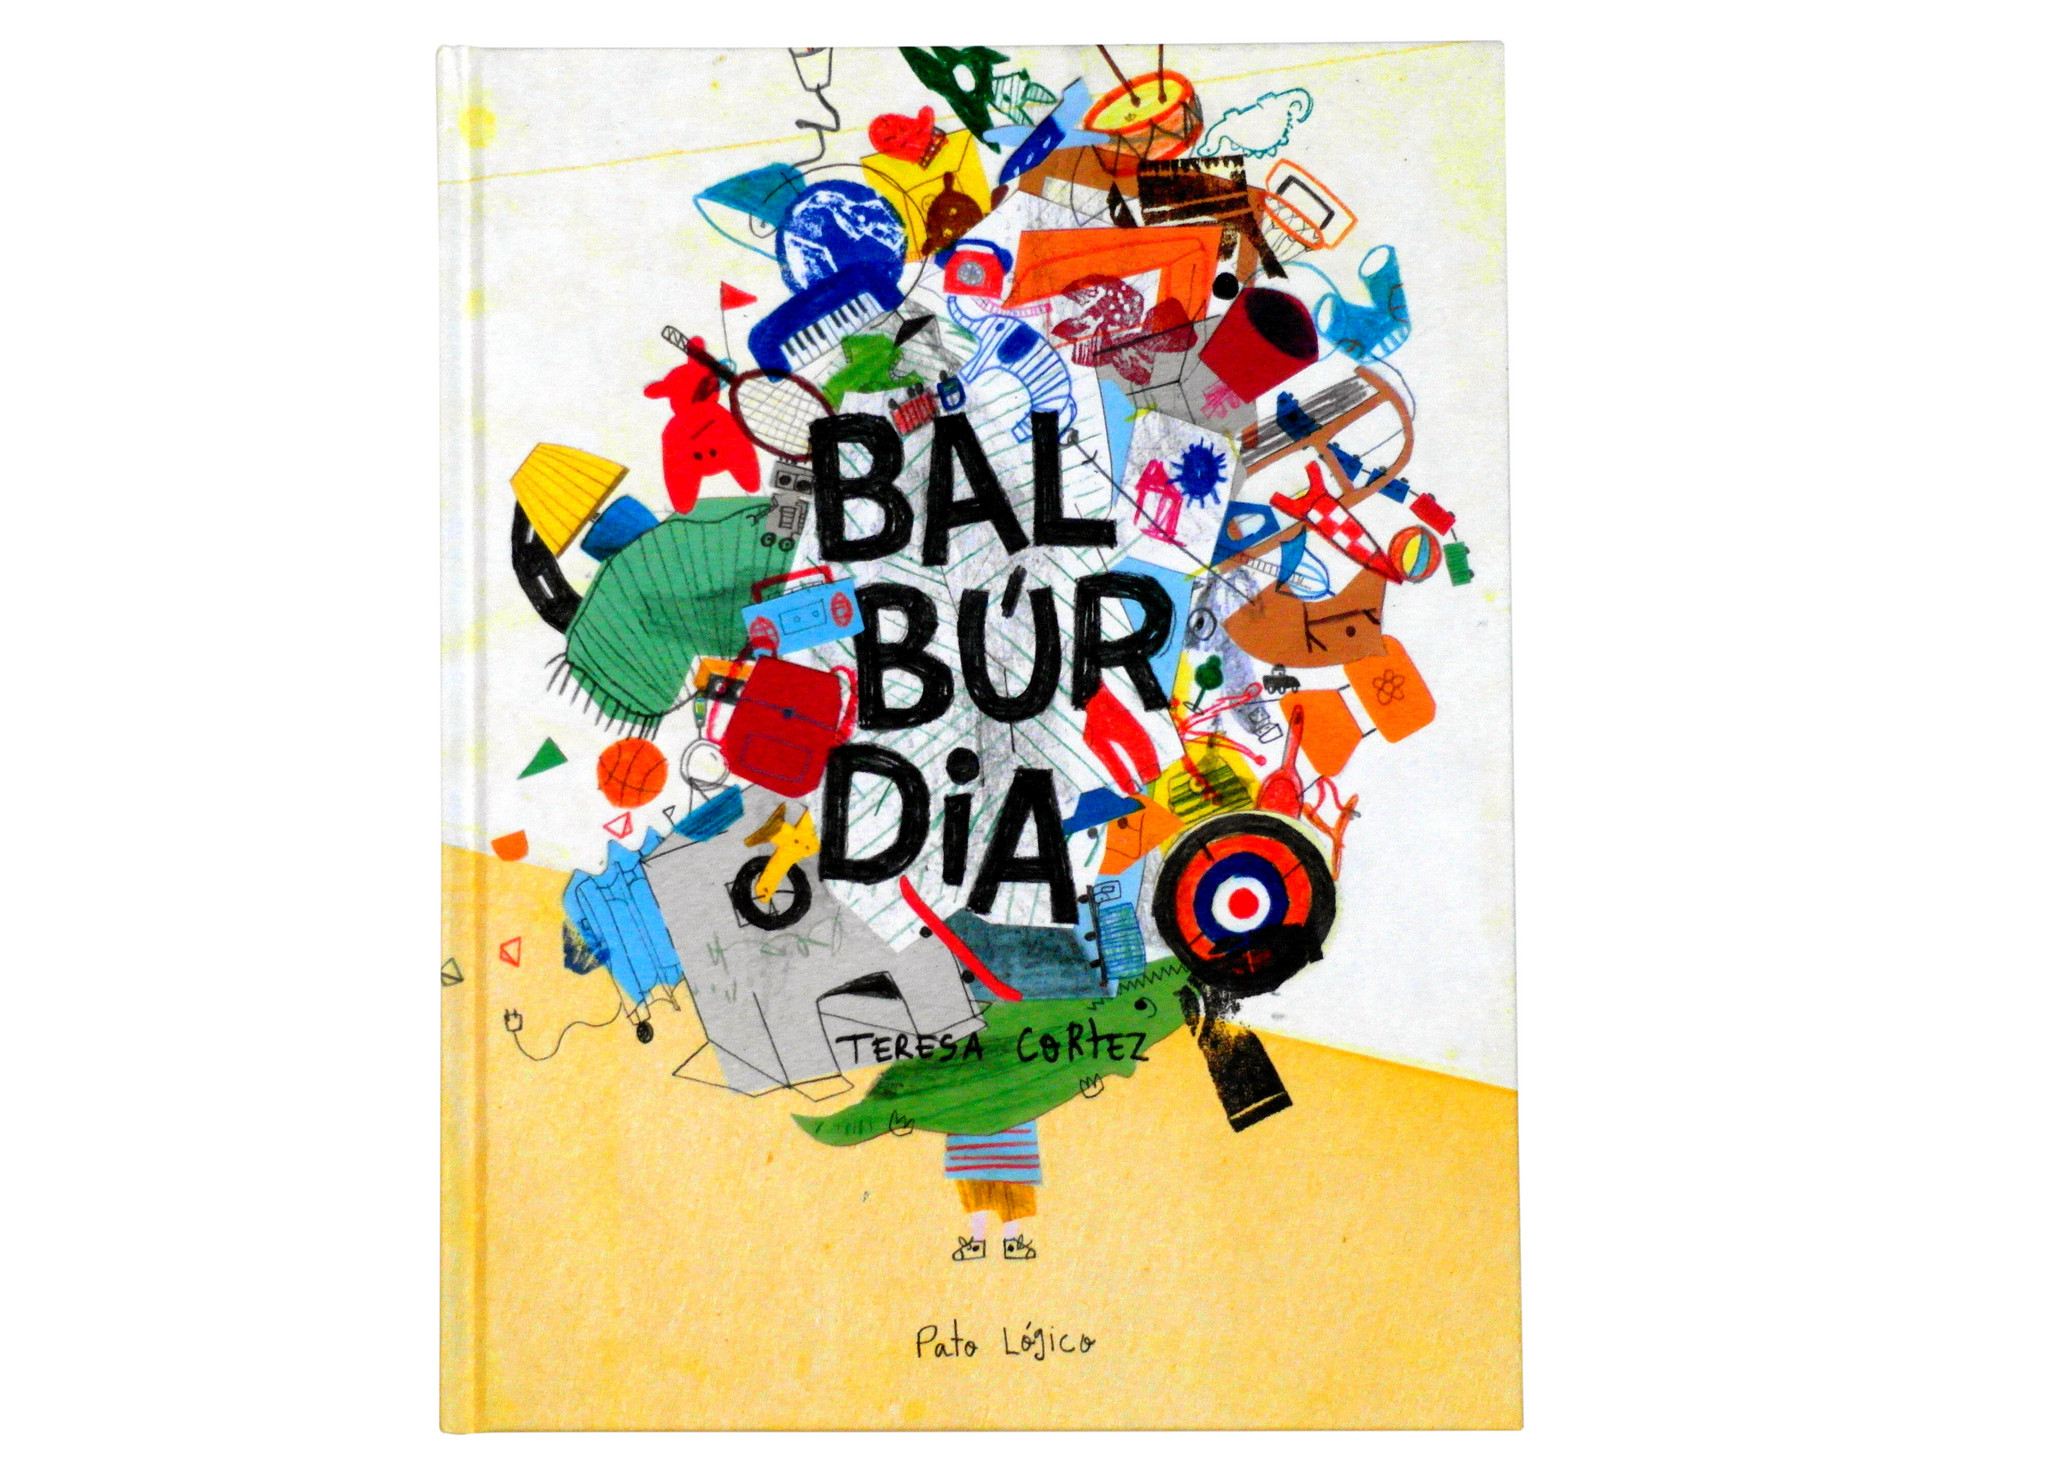 DR livro Balburdia 01.jpg